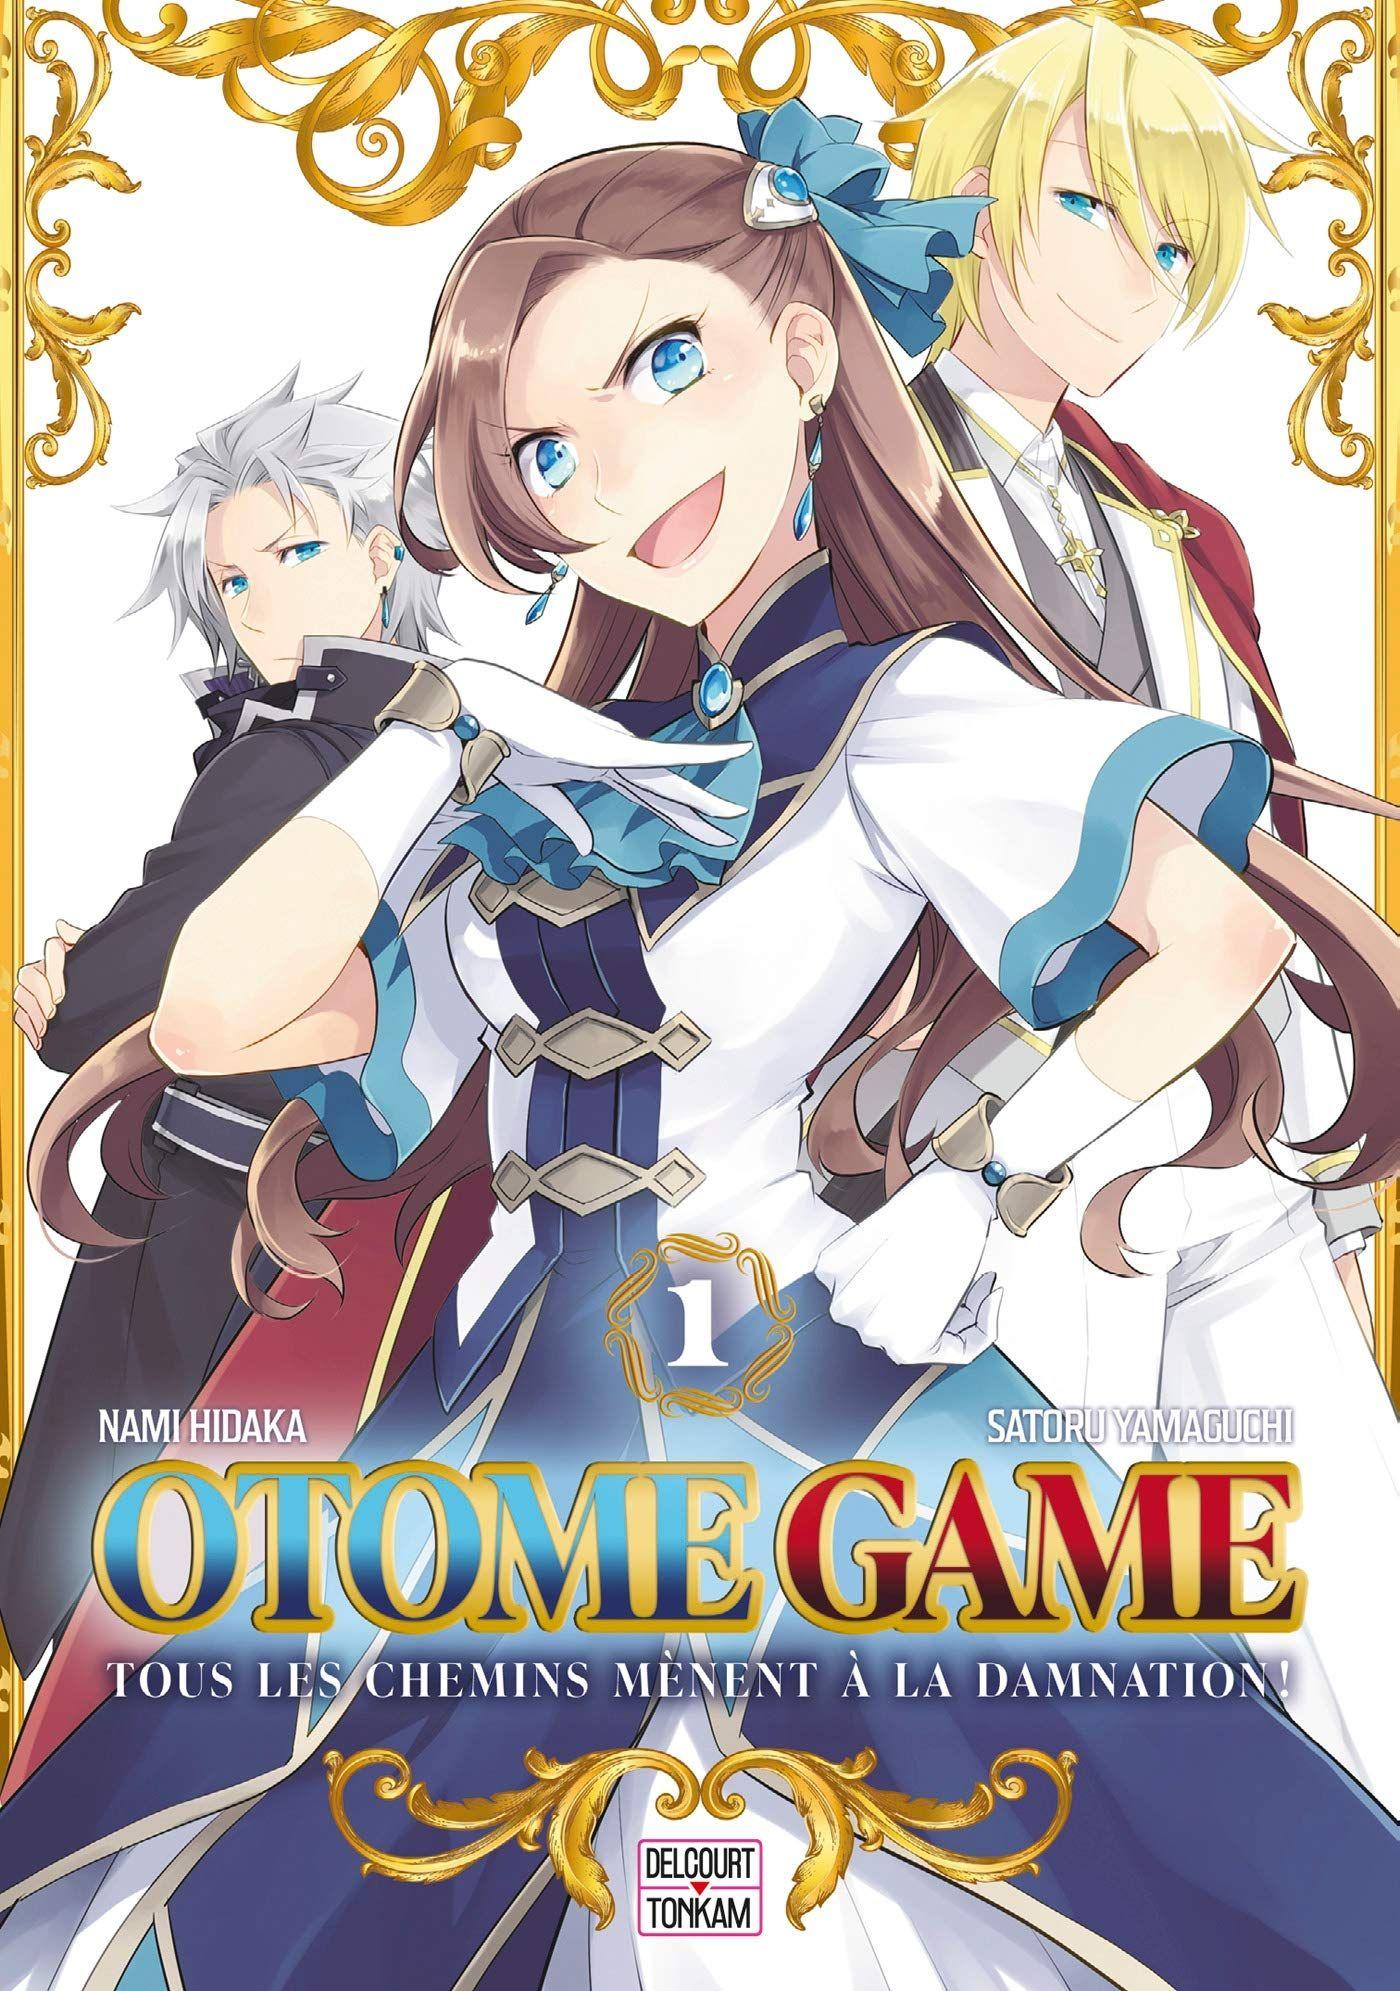 Otome Game - Manga série - Manga news